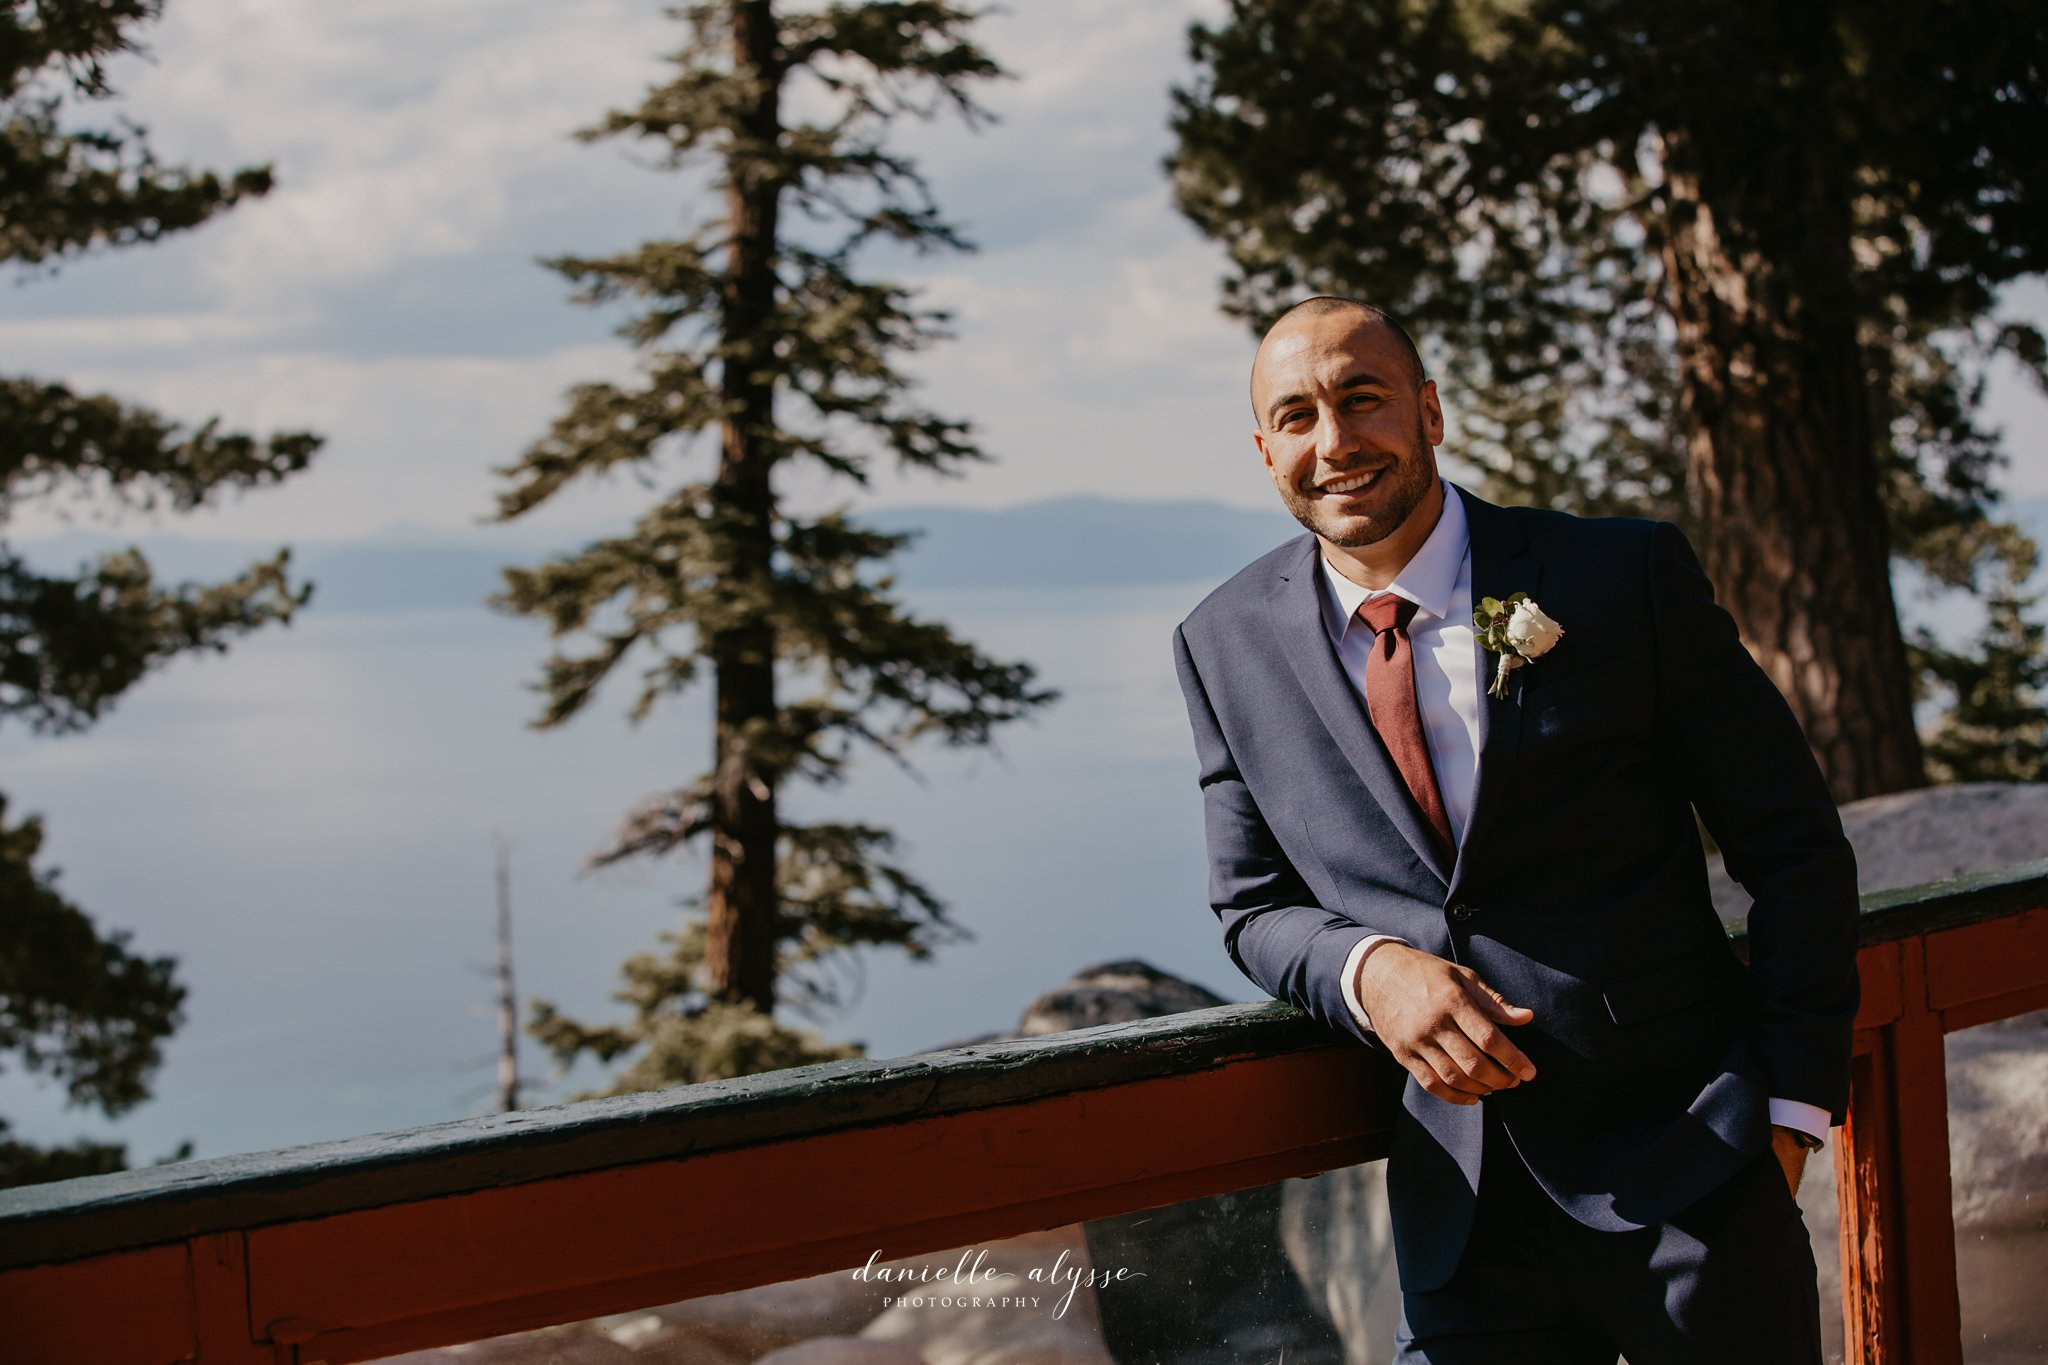 180831_wedding_stephanie_heavenly_south_lake_tahoe_danielle_alysse_photography_destination_blog_496_WEB.jpg